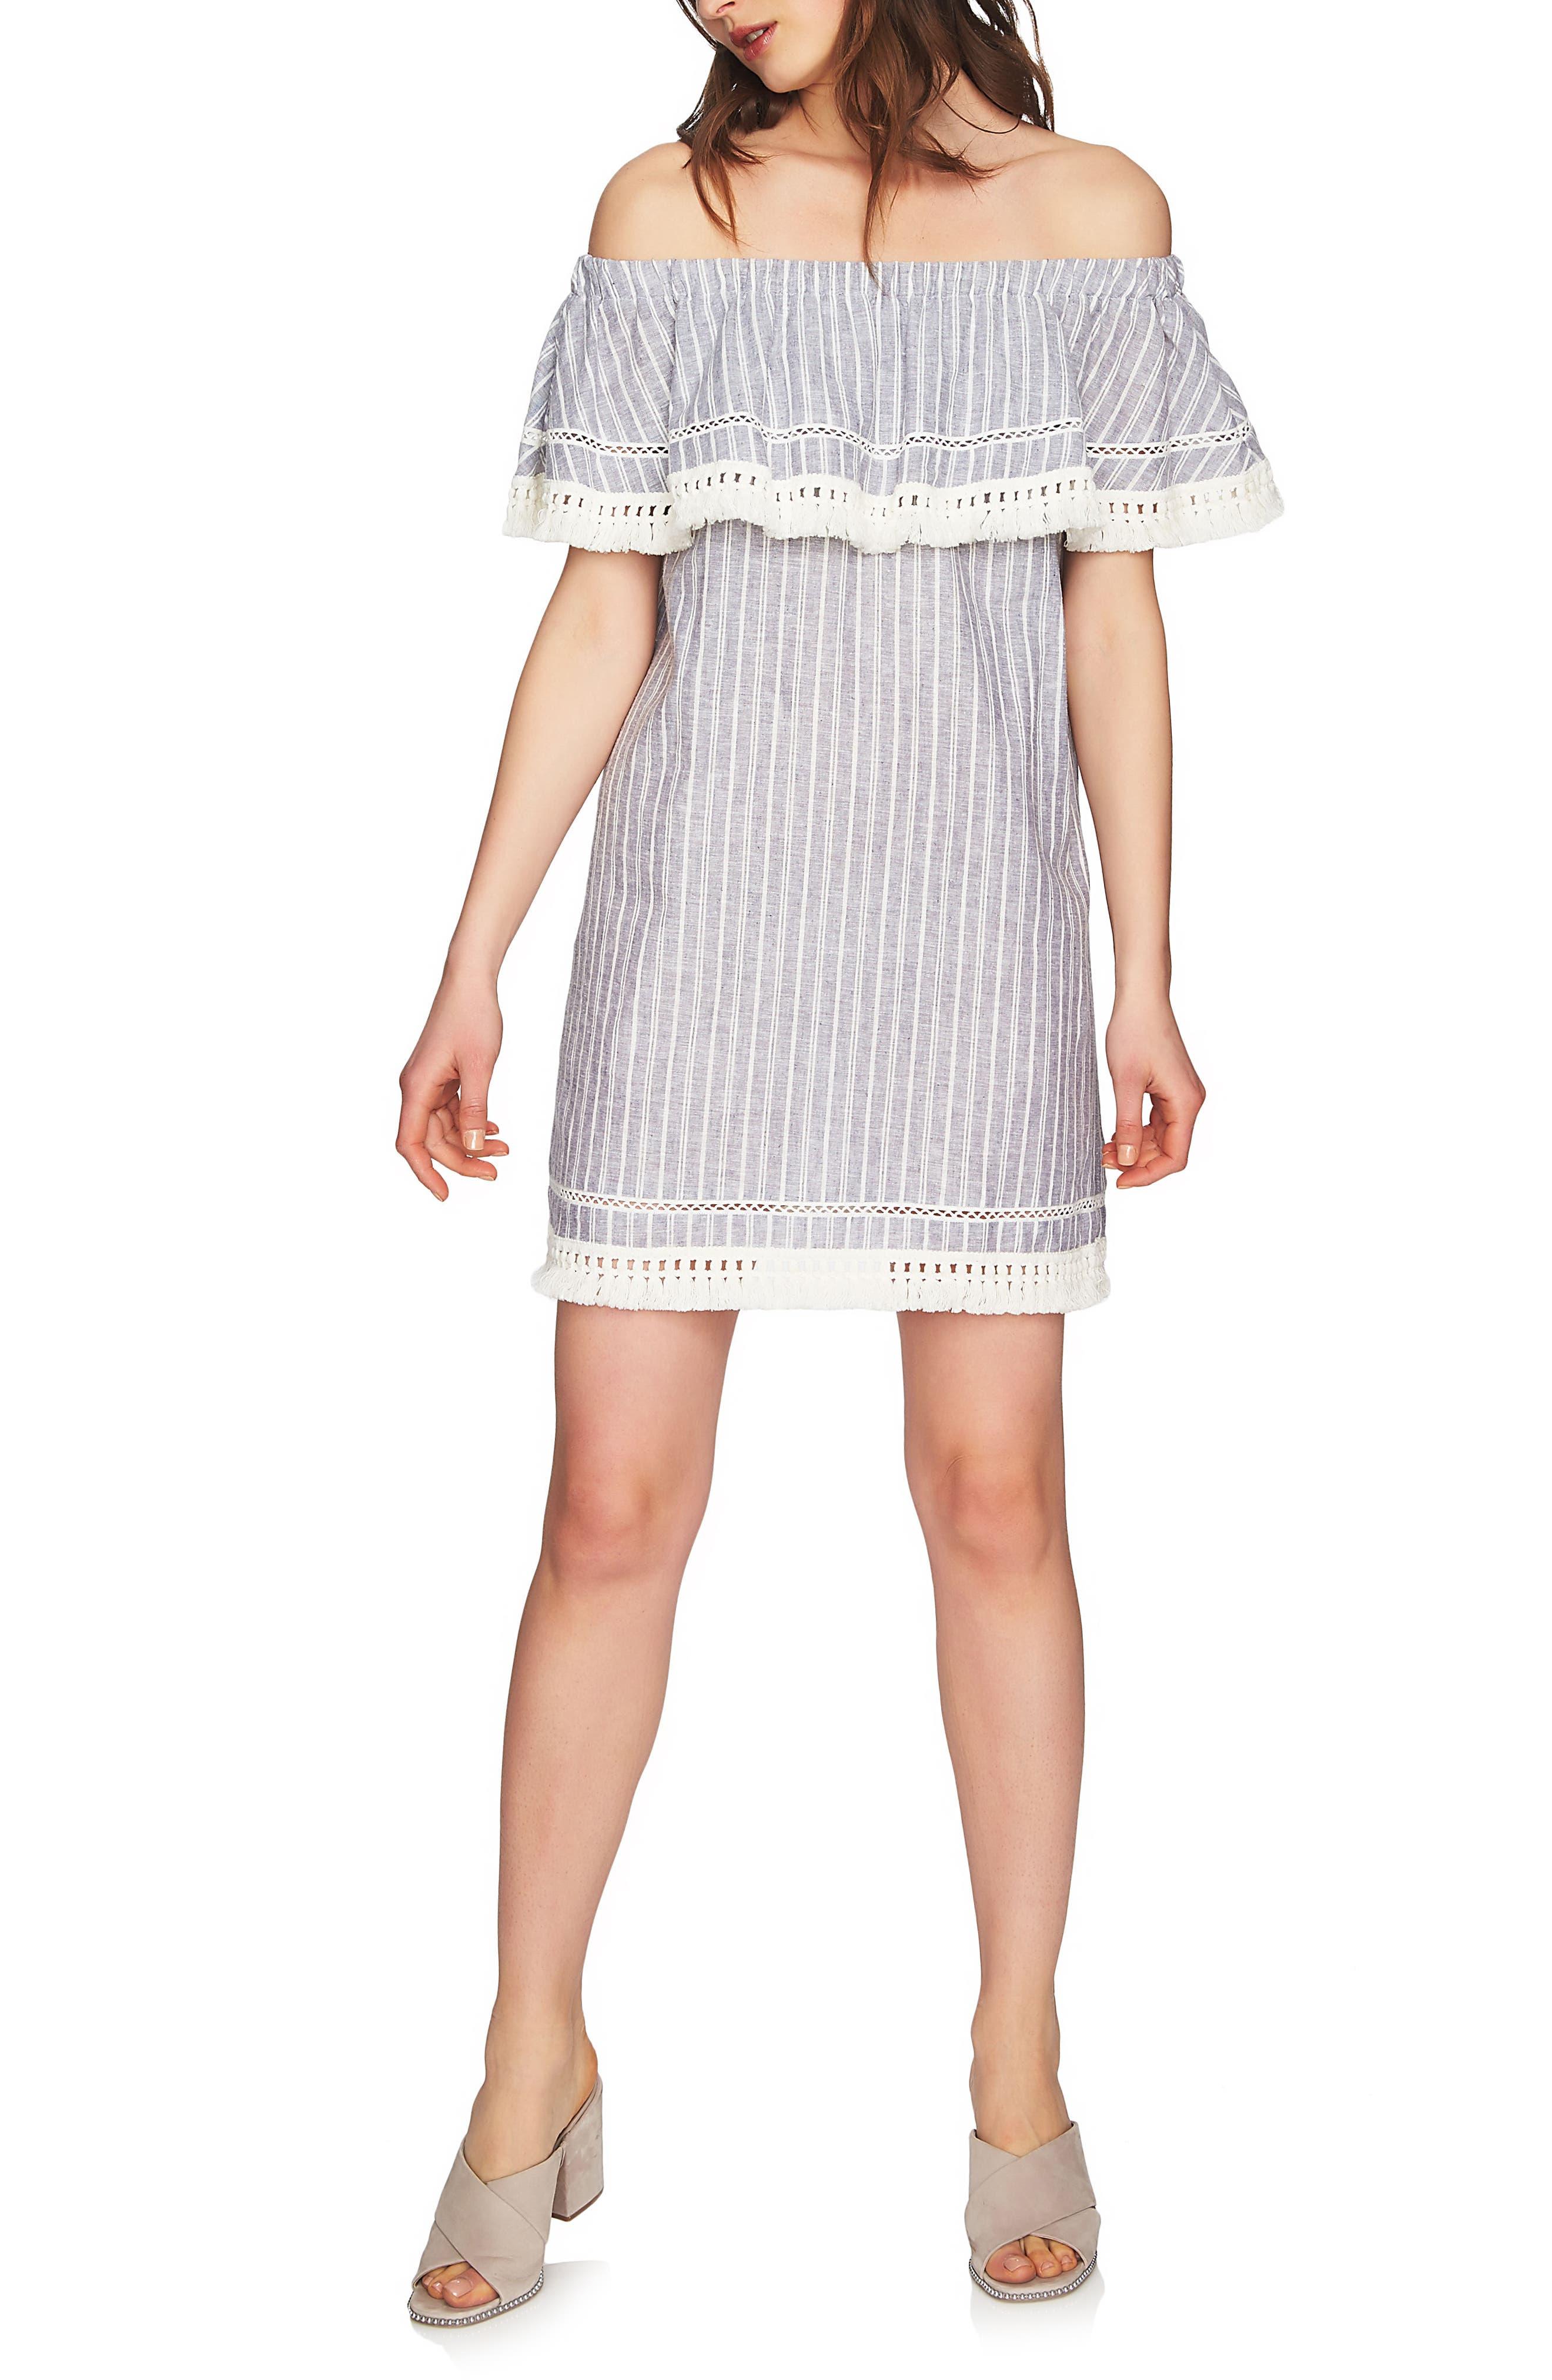 Main Image - 1.STATE Off the Shoulder Shift Dress